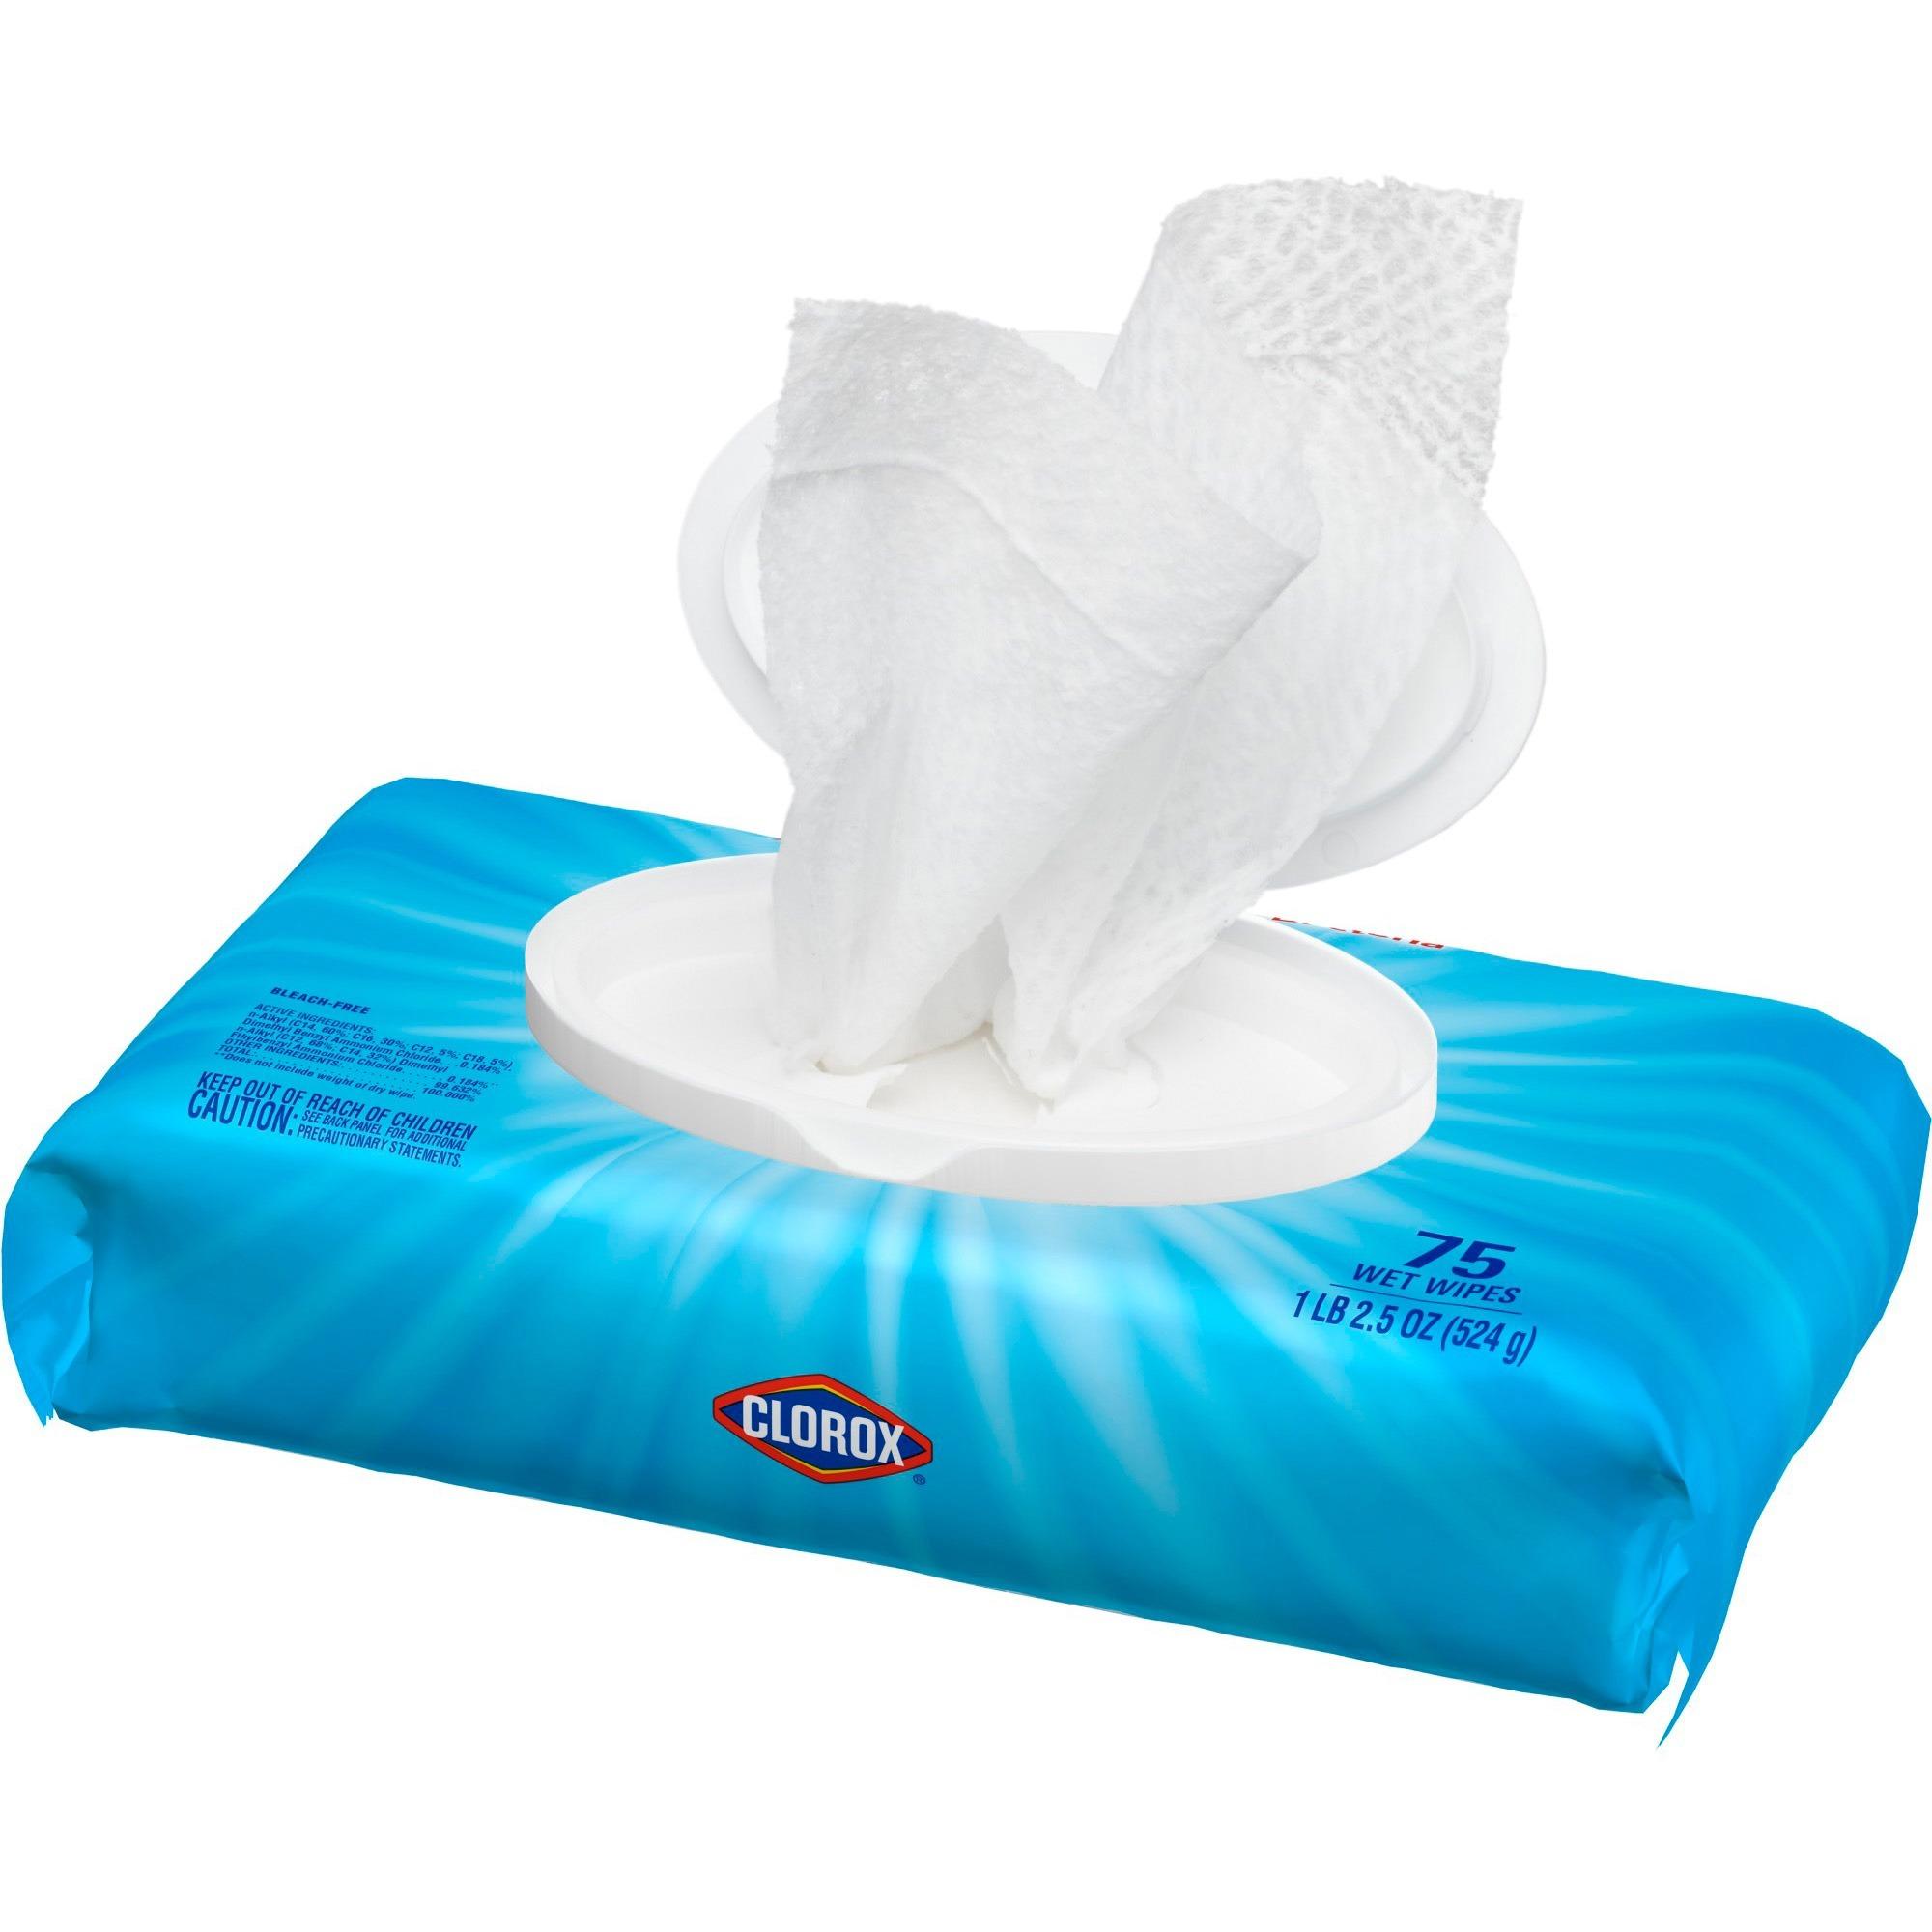 Clorox Disinfecting Wipes Flex Pack